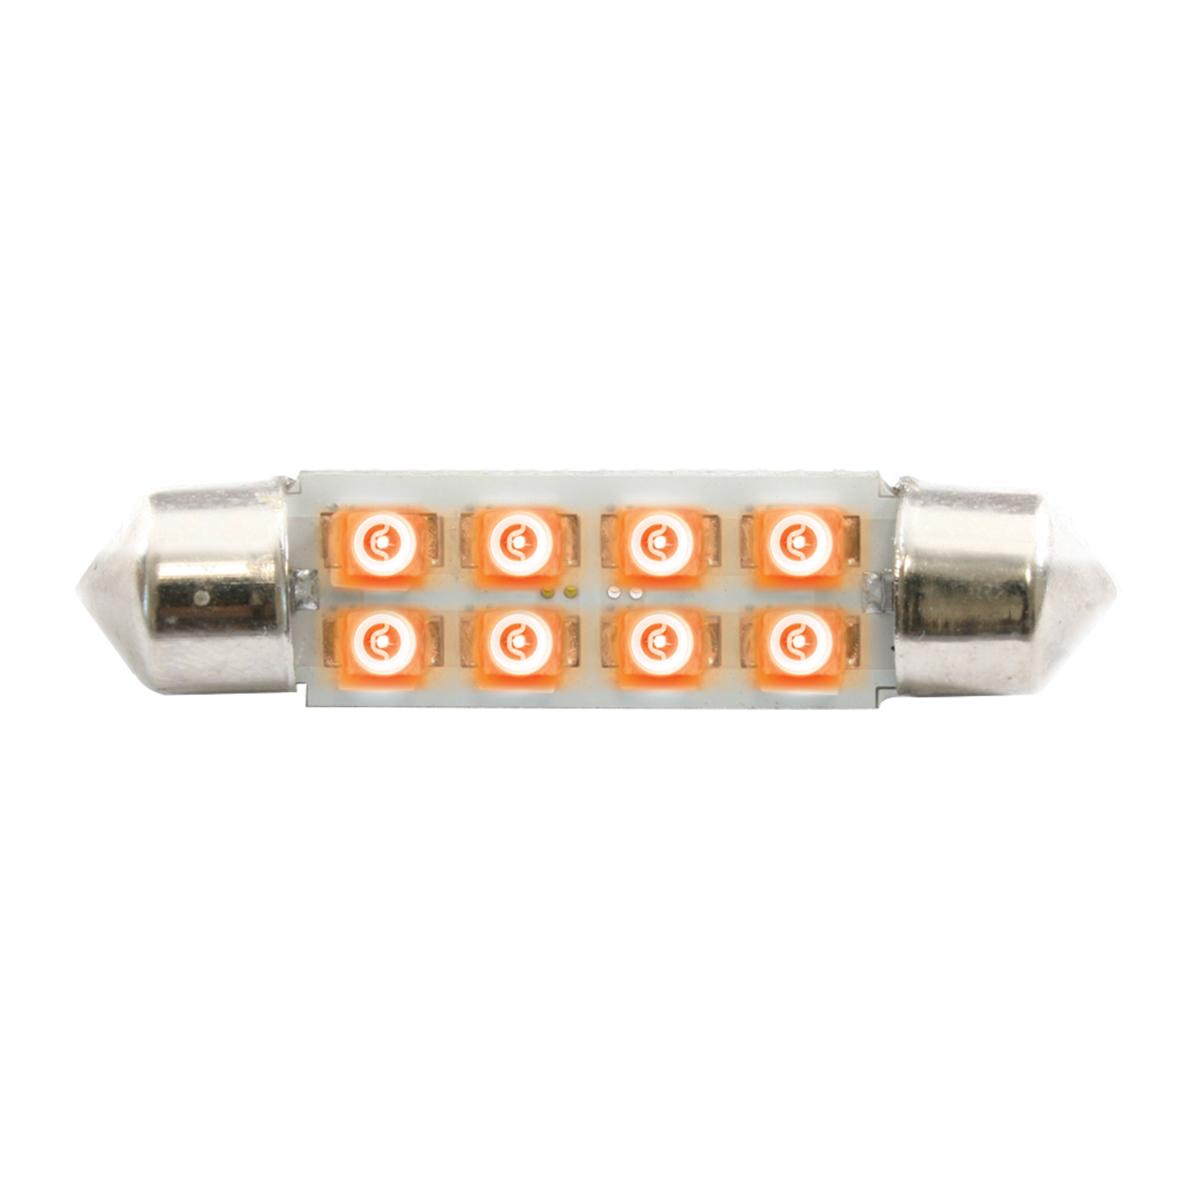 77150 Amber 211-2 Dome Type 8 LED Light Bulb